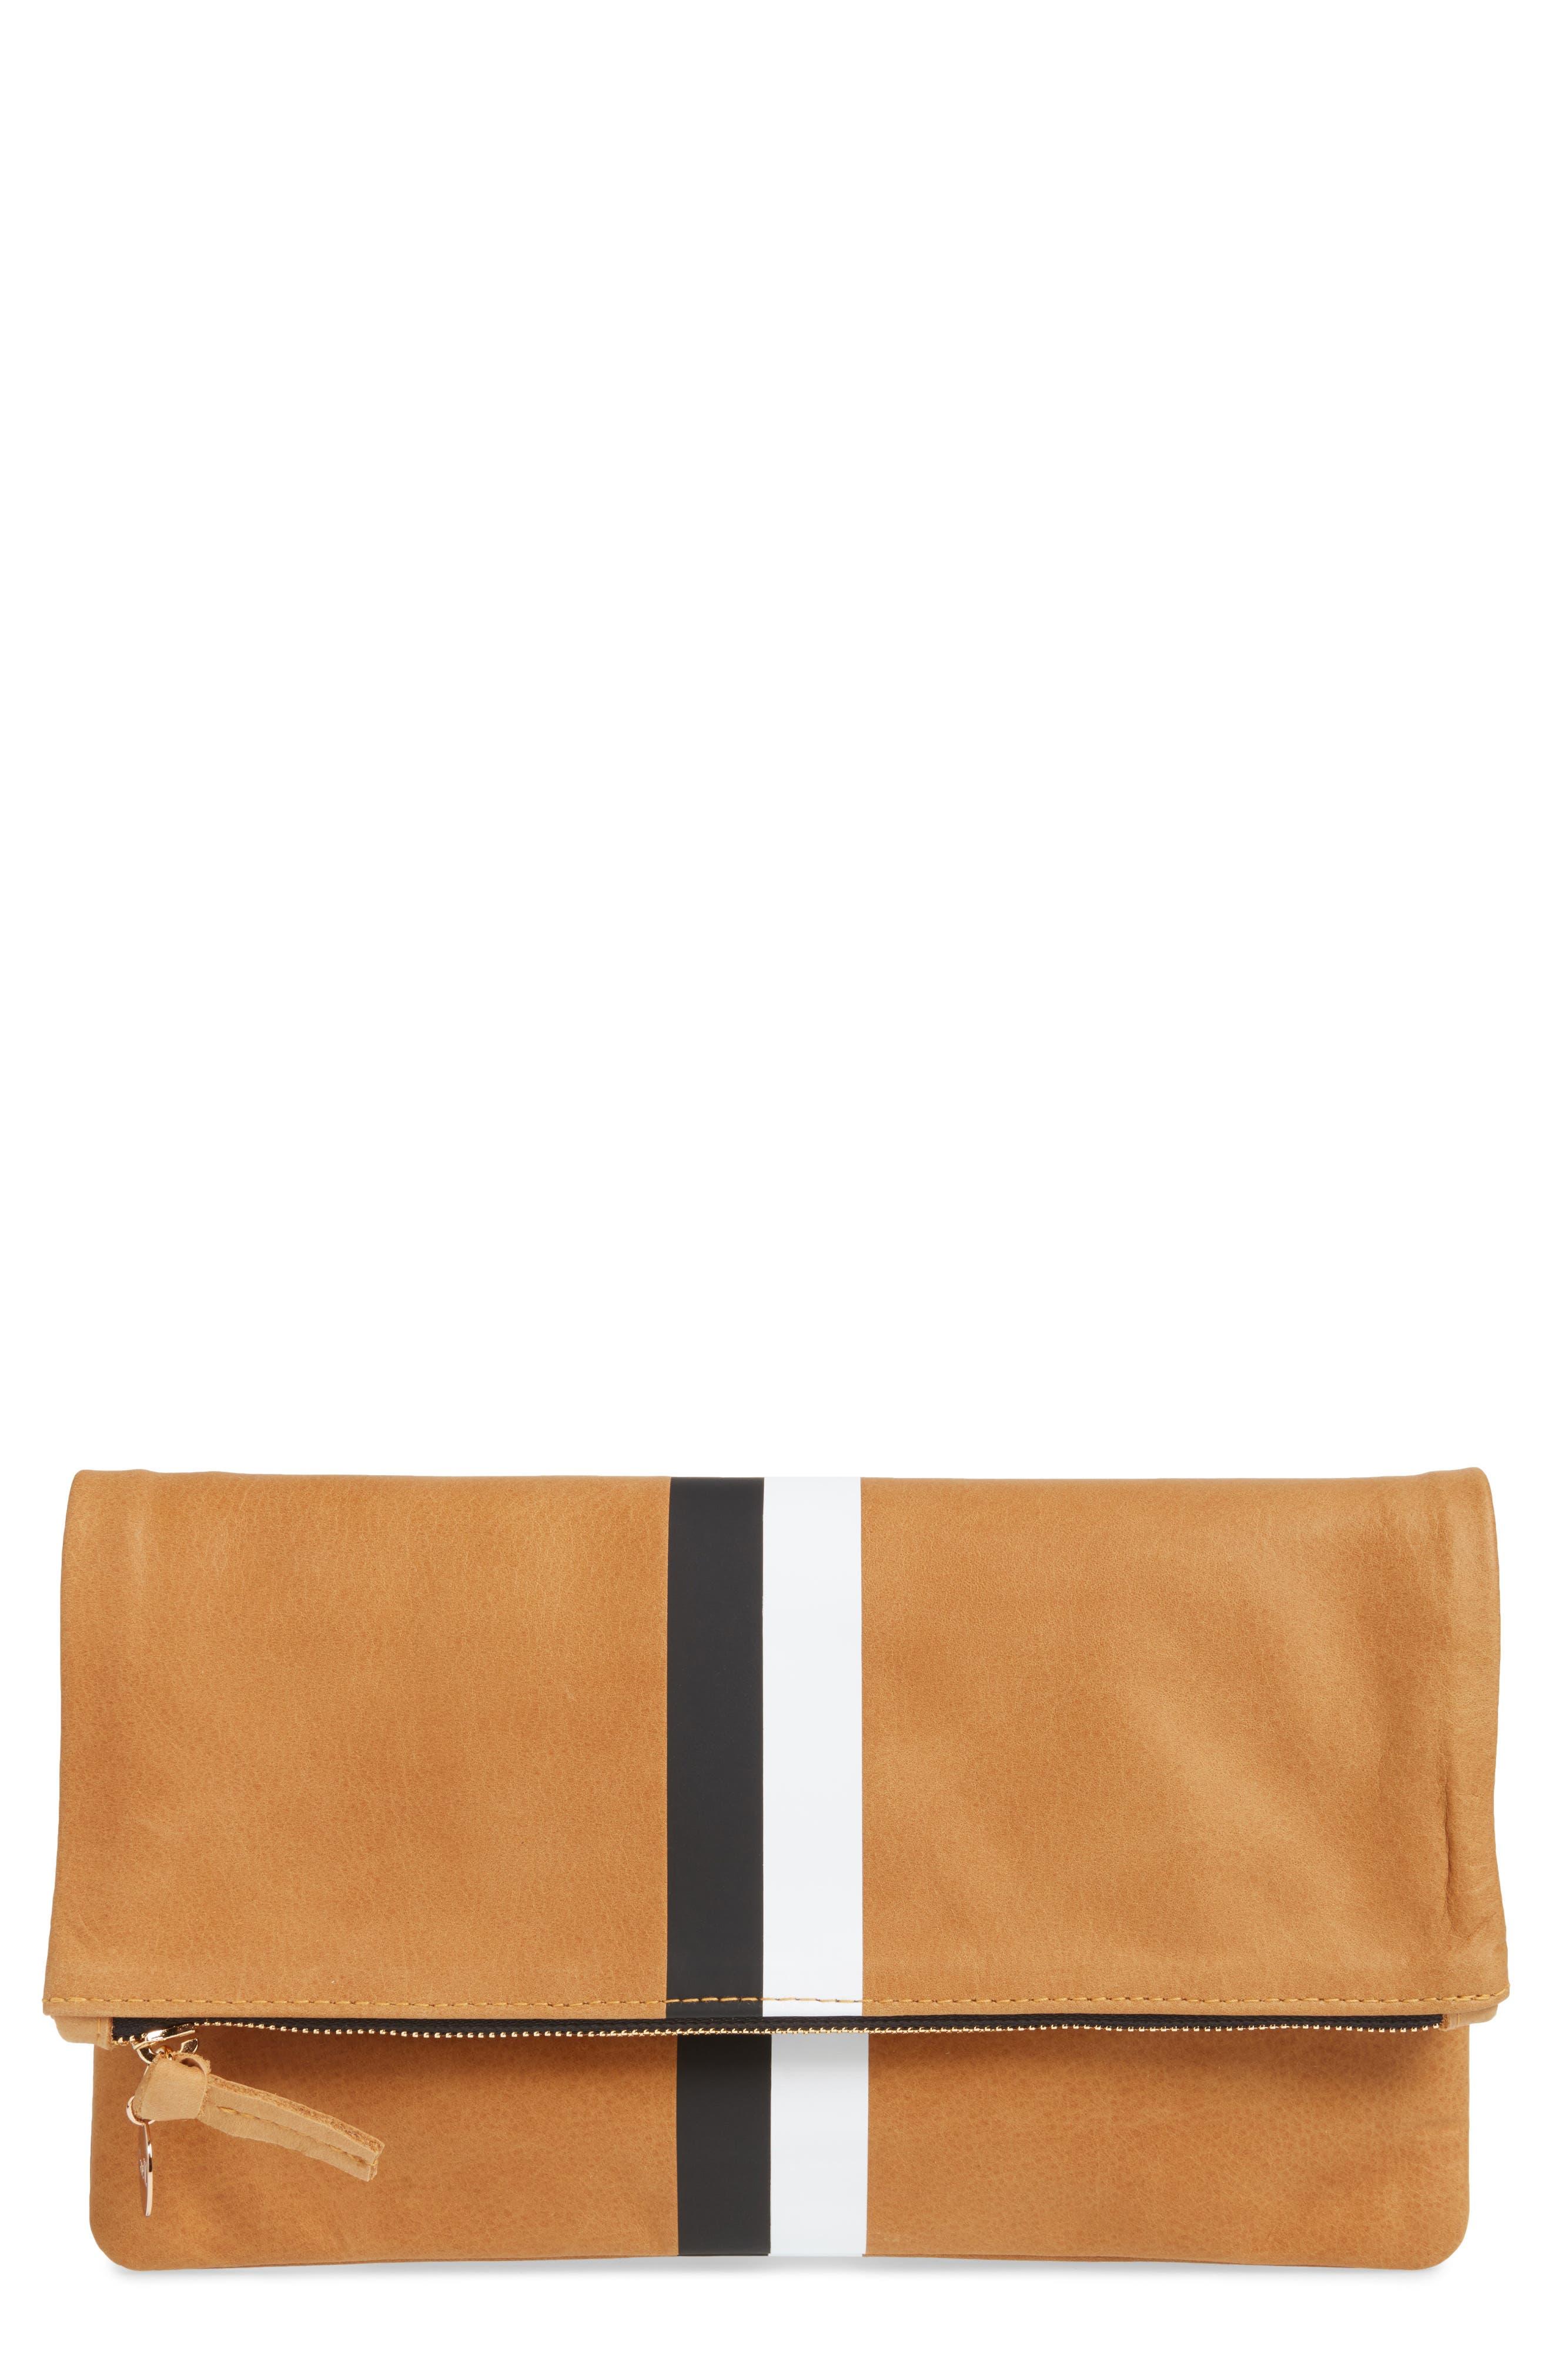 Center Stripe Leather Foldover Clutch,                         Main,                         color, Nubuck Blck Whte Stripe